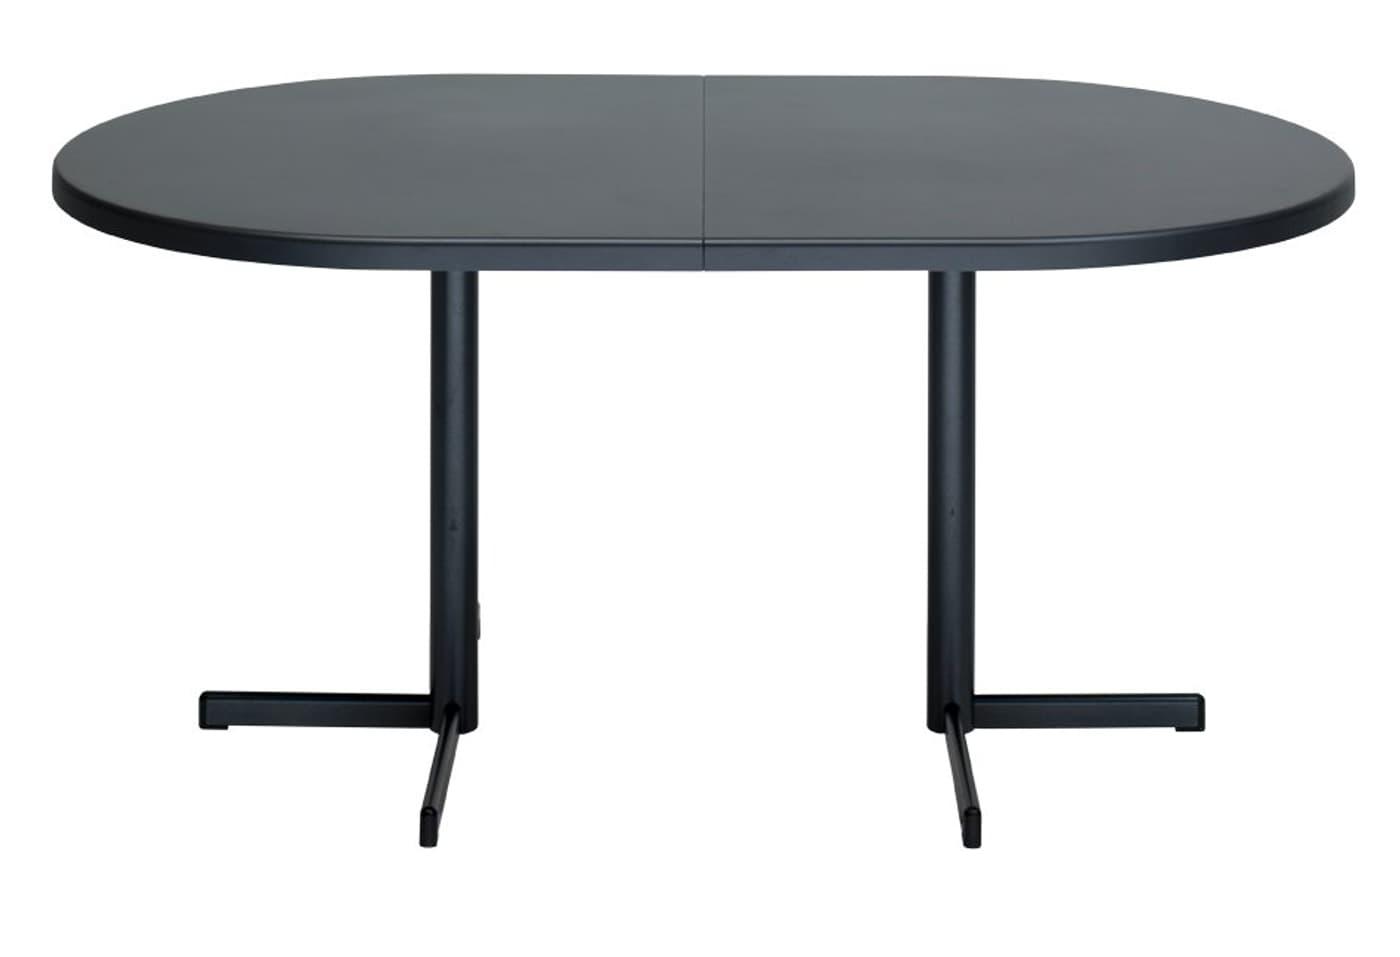 Schaffner Table A Rallonge Vienna 160 218 Cm Migros